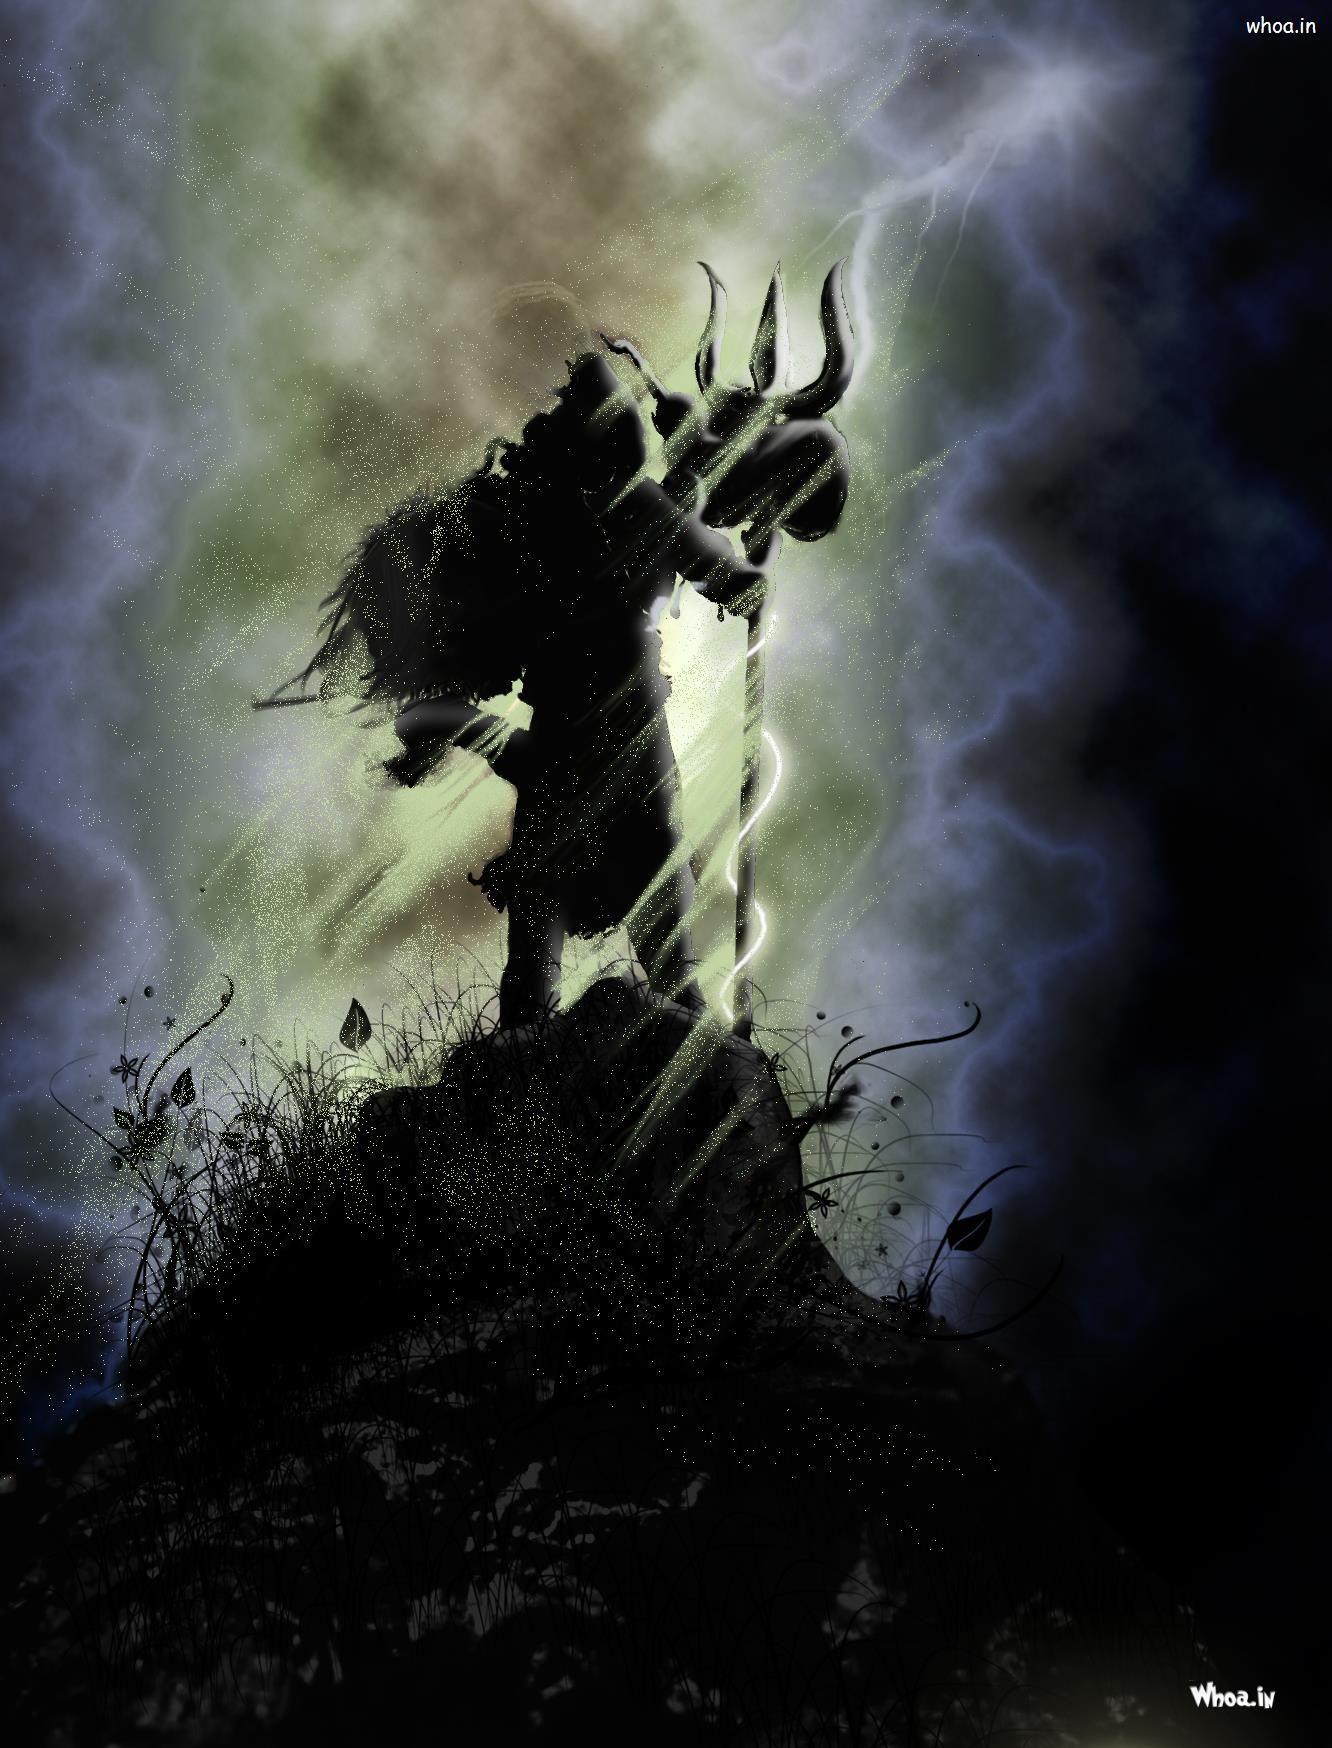 62 Wallpaper Angry Rudra Shiva Hd Get Latest Movie Hd